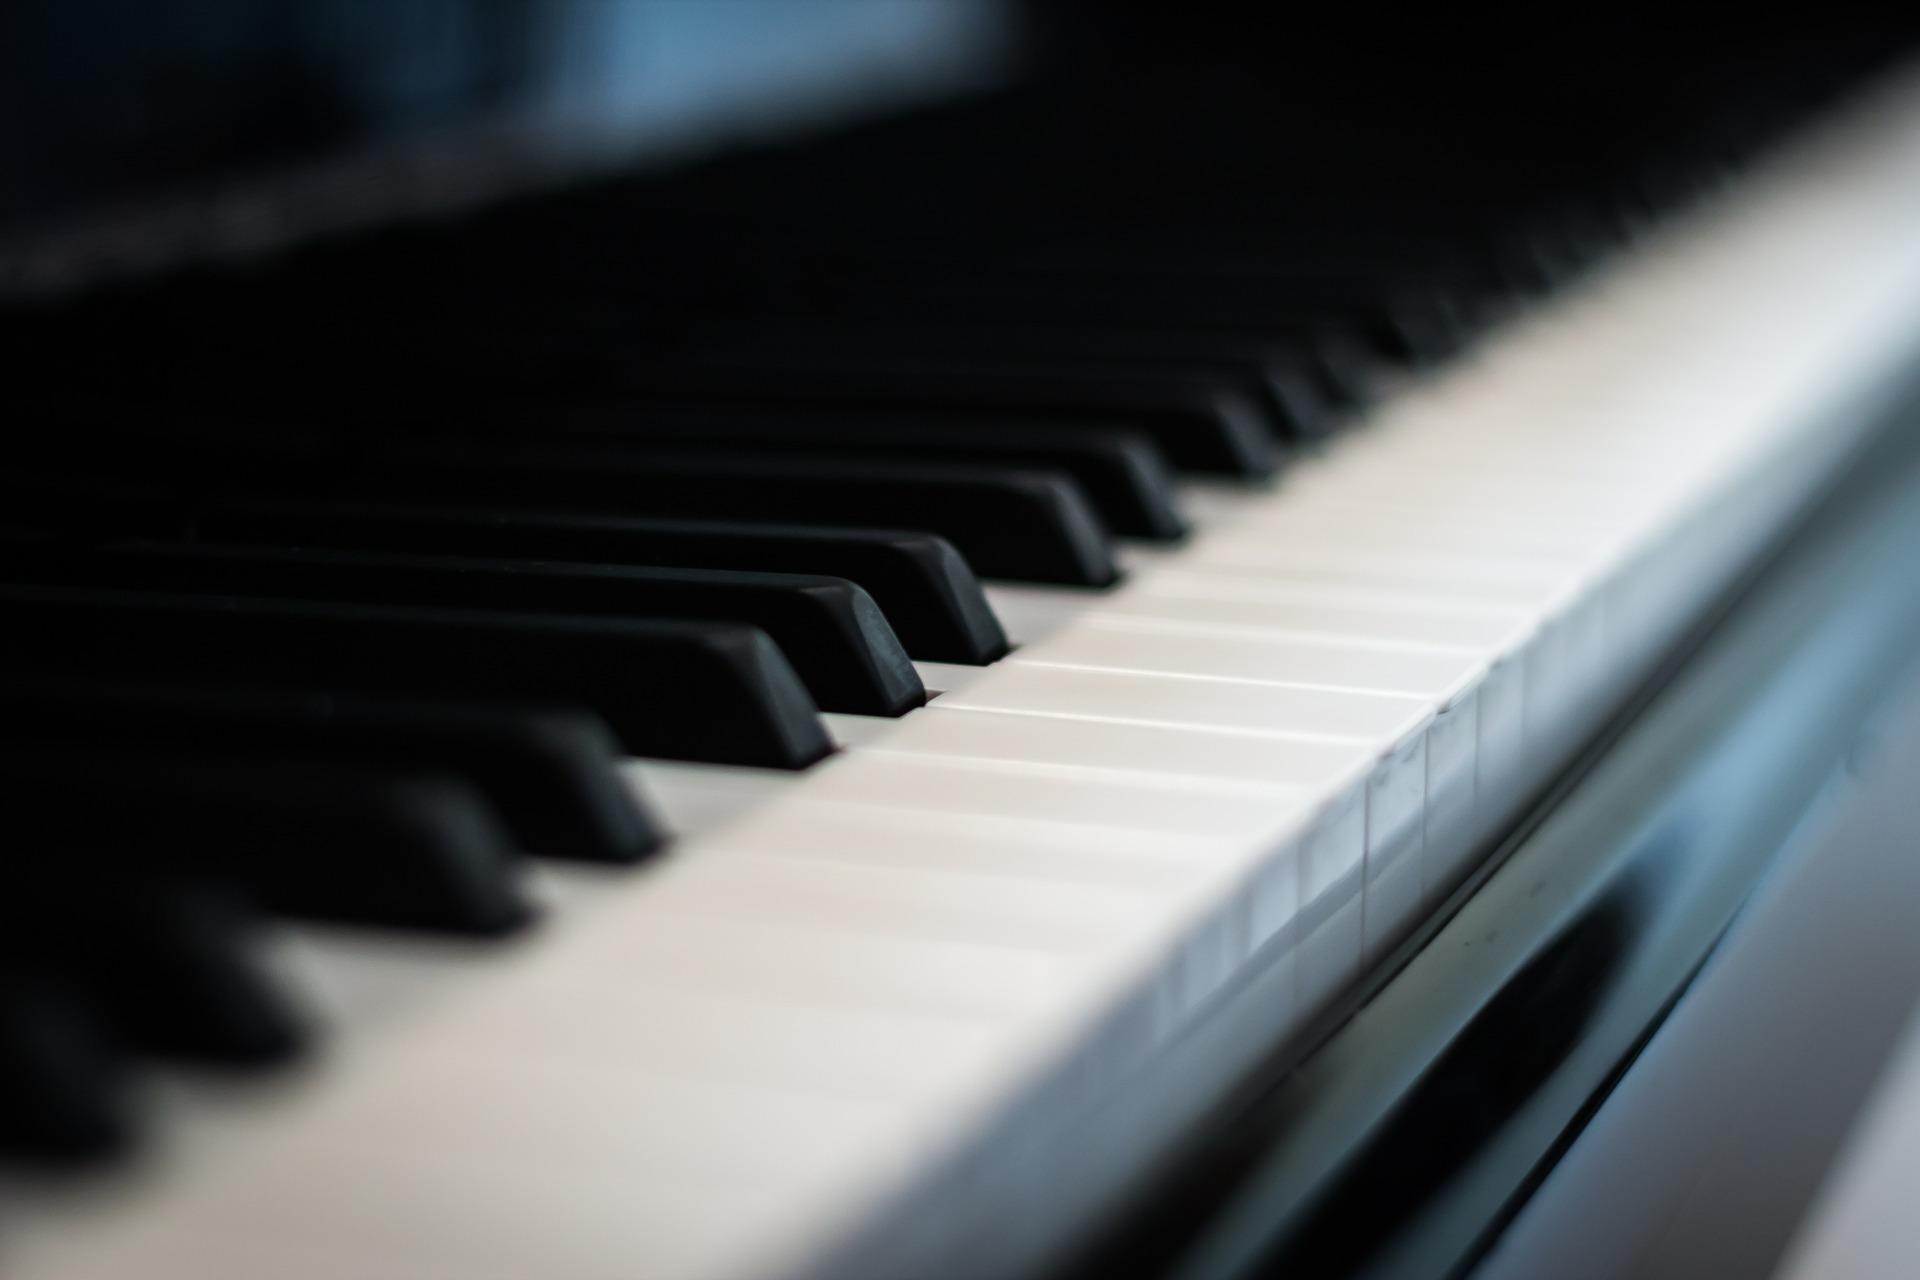 Alex_Shore_Buying_A_Piano_Advice